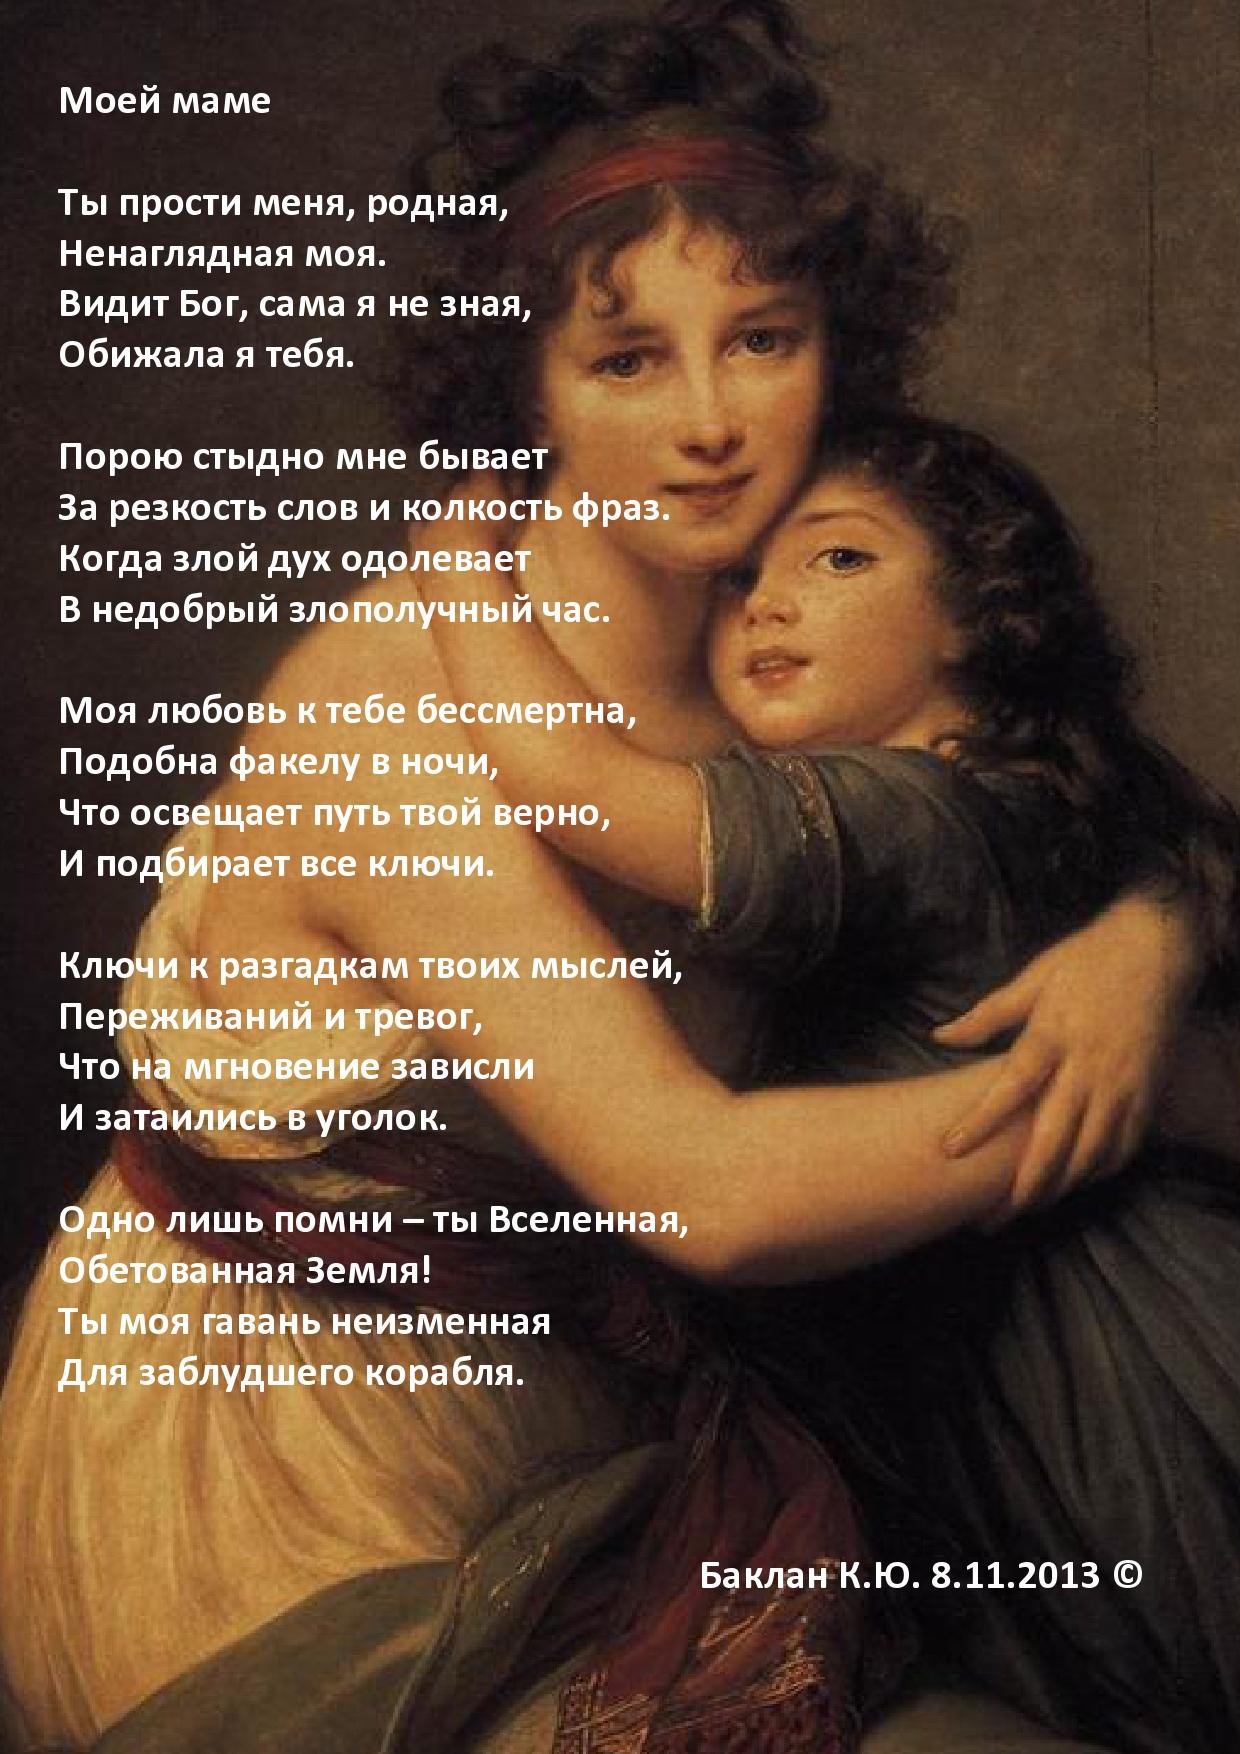 Стихи о маме - Детский сад 95